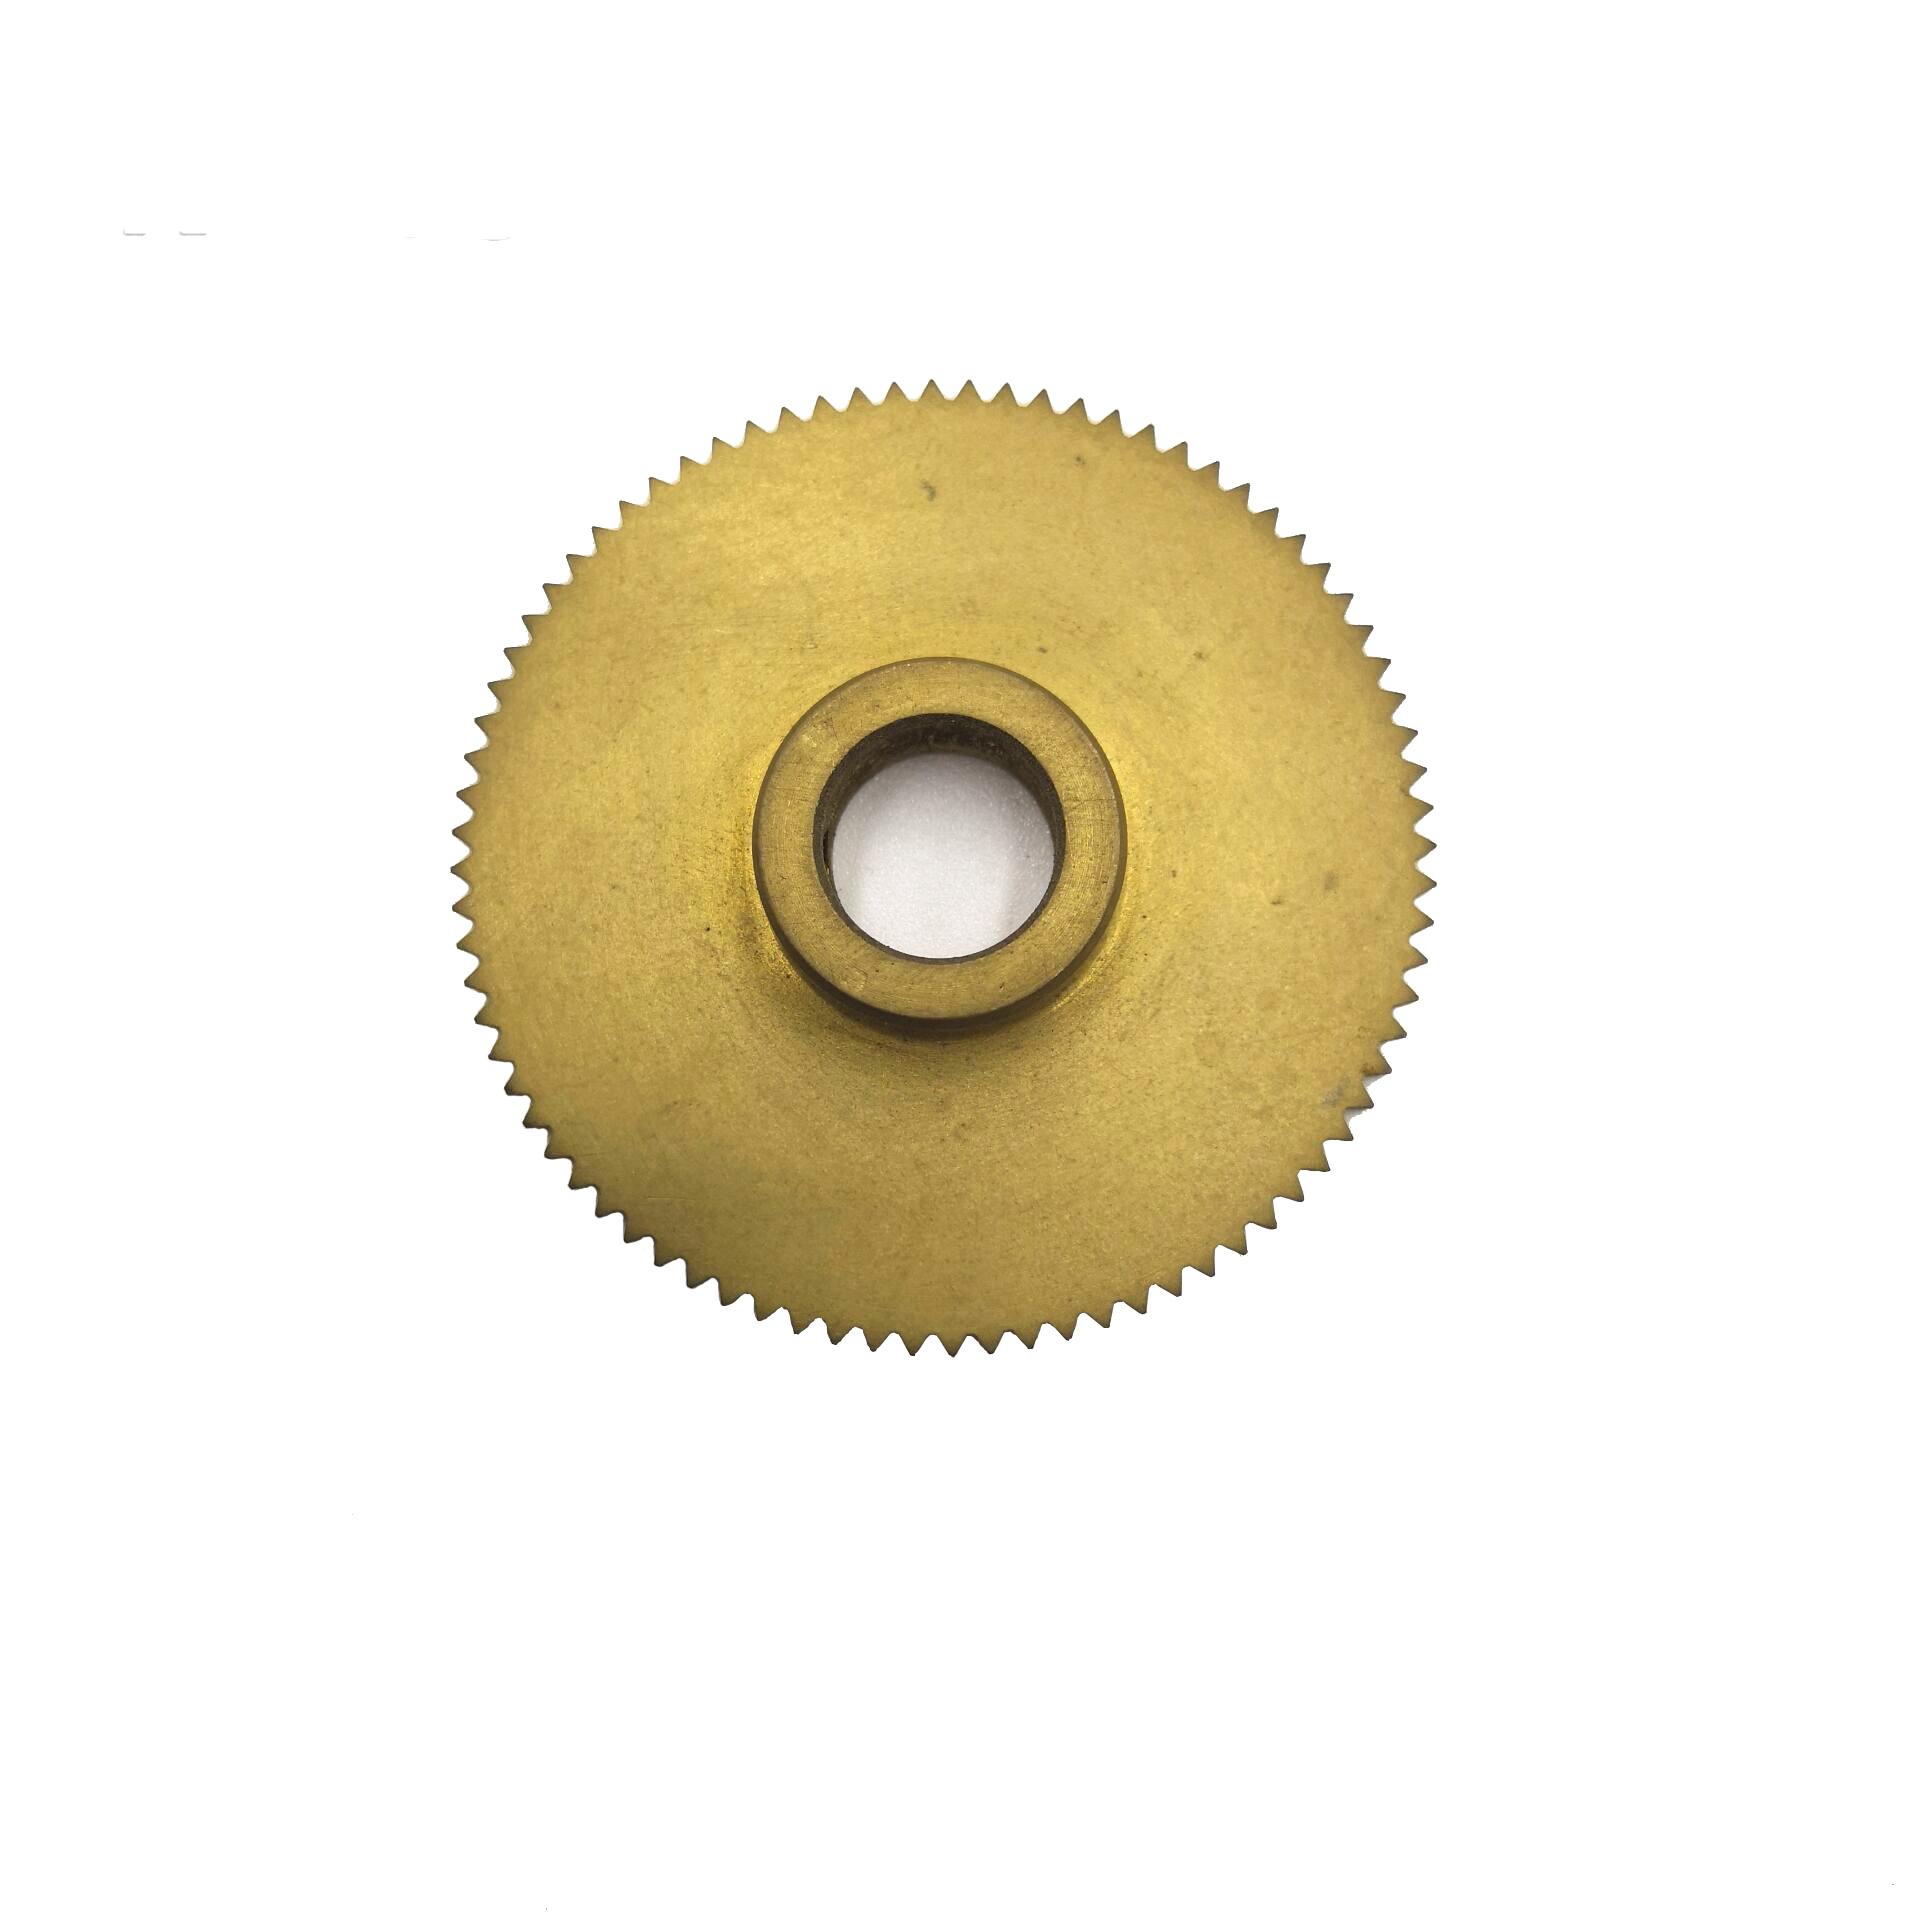 Custom CNC Milled Precision Parts